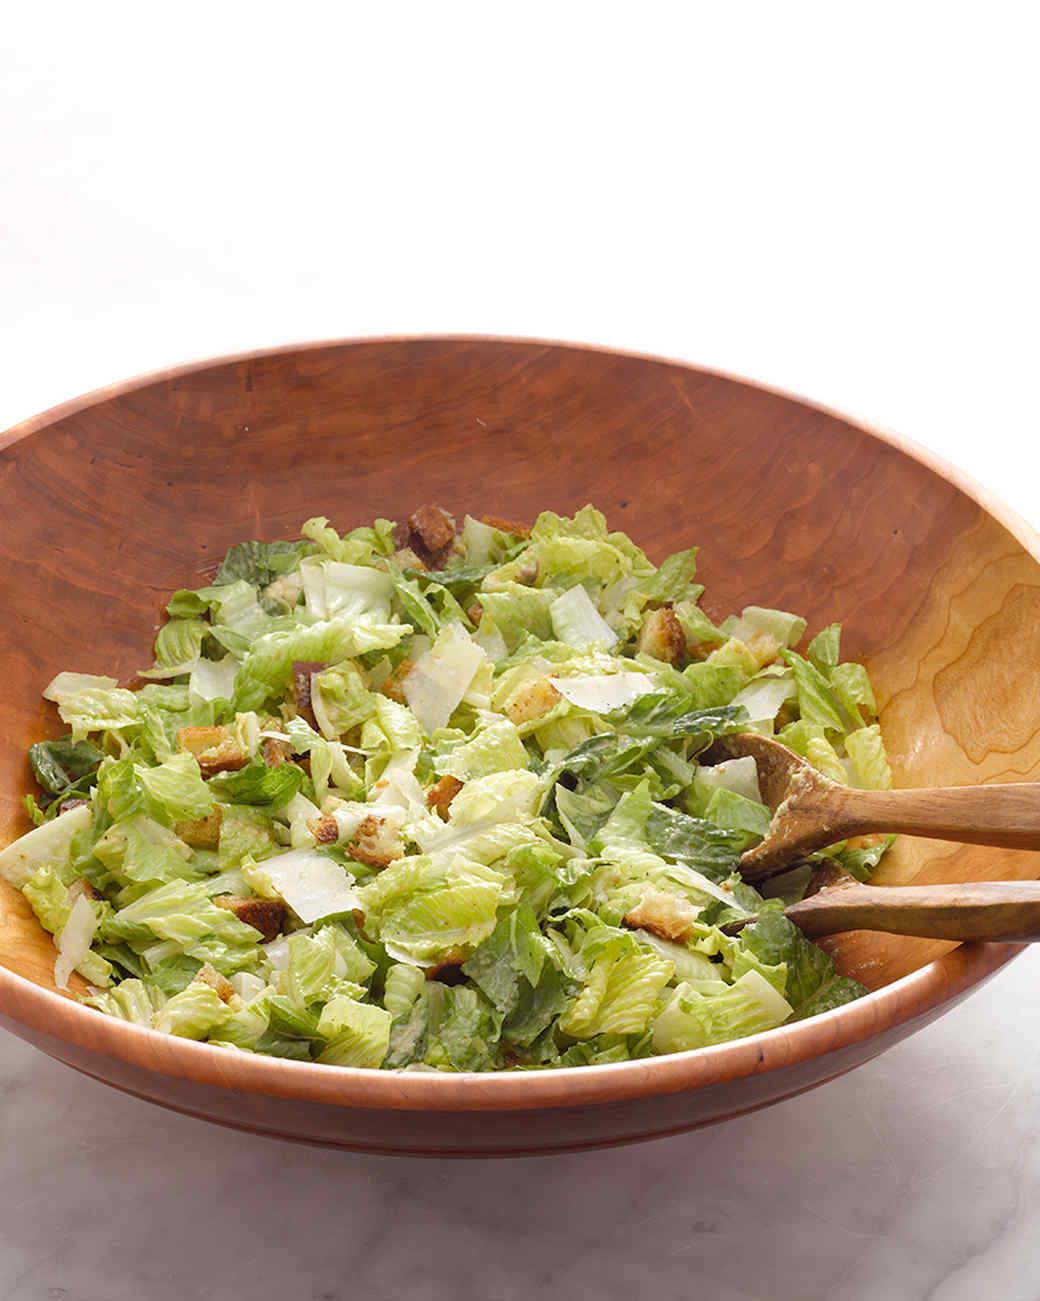 martha-stewart-cooking-school-caesar-salad-am-0009-d110633-20130923.jpg